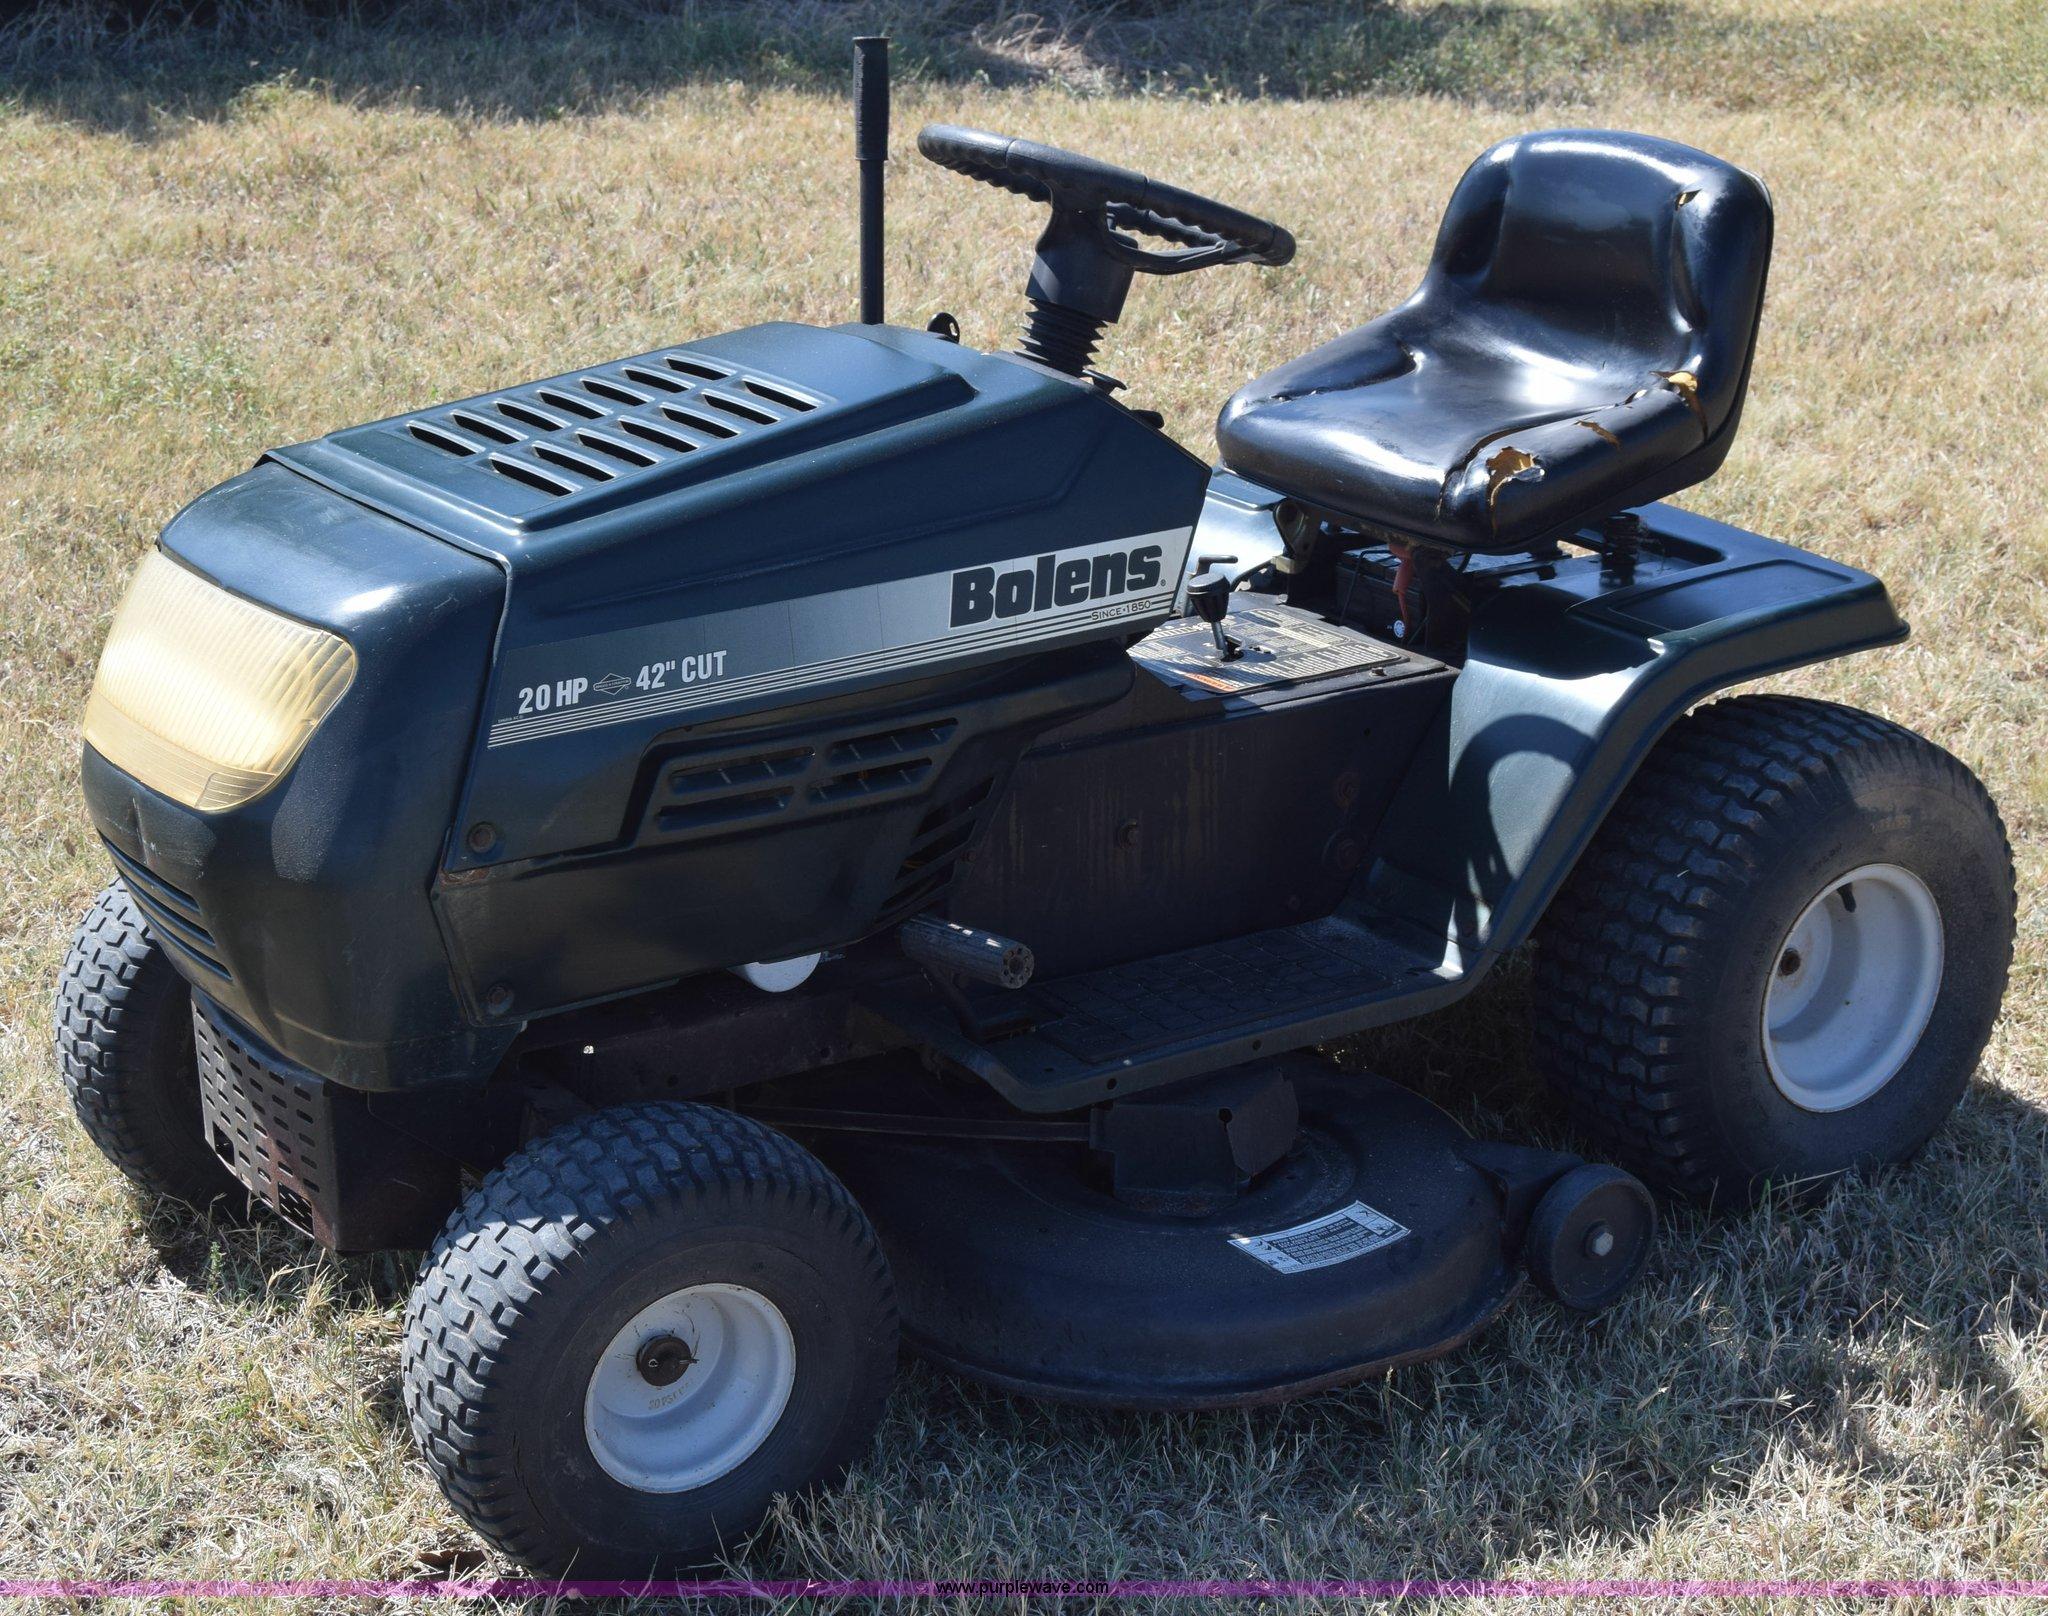 Bolens Lawn Tractor Wiring Diagram 2000 Dodge Ram 1500 Schematic